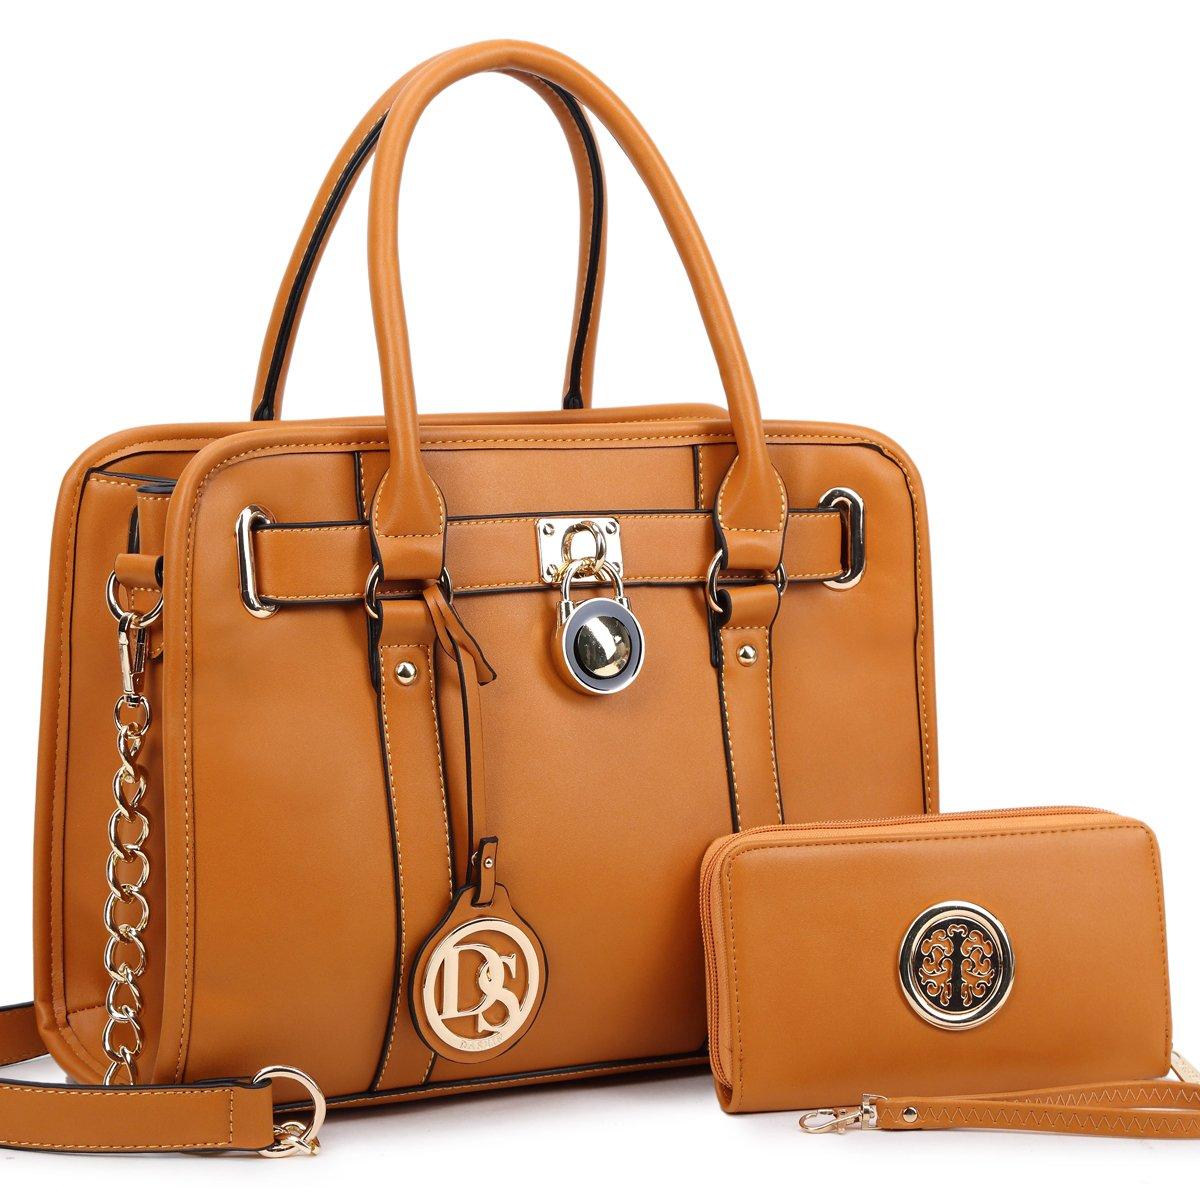 Dasein Women's Satchel Handbags Designer Padlock Purses Shoulder Bags Work Bags w/Chain Strap